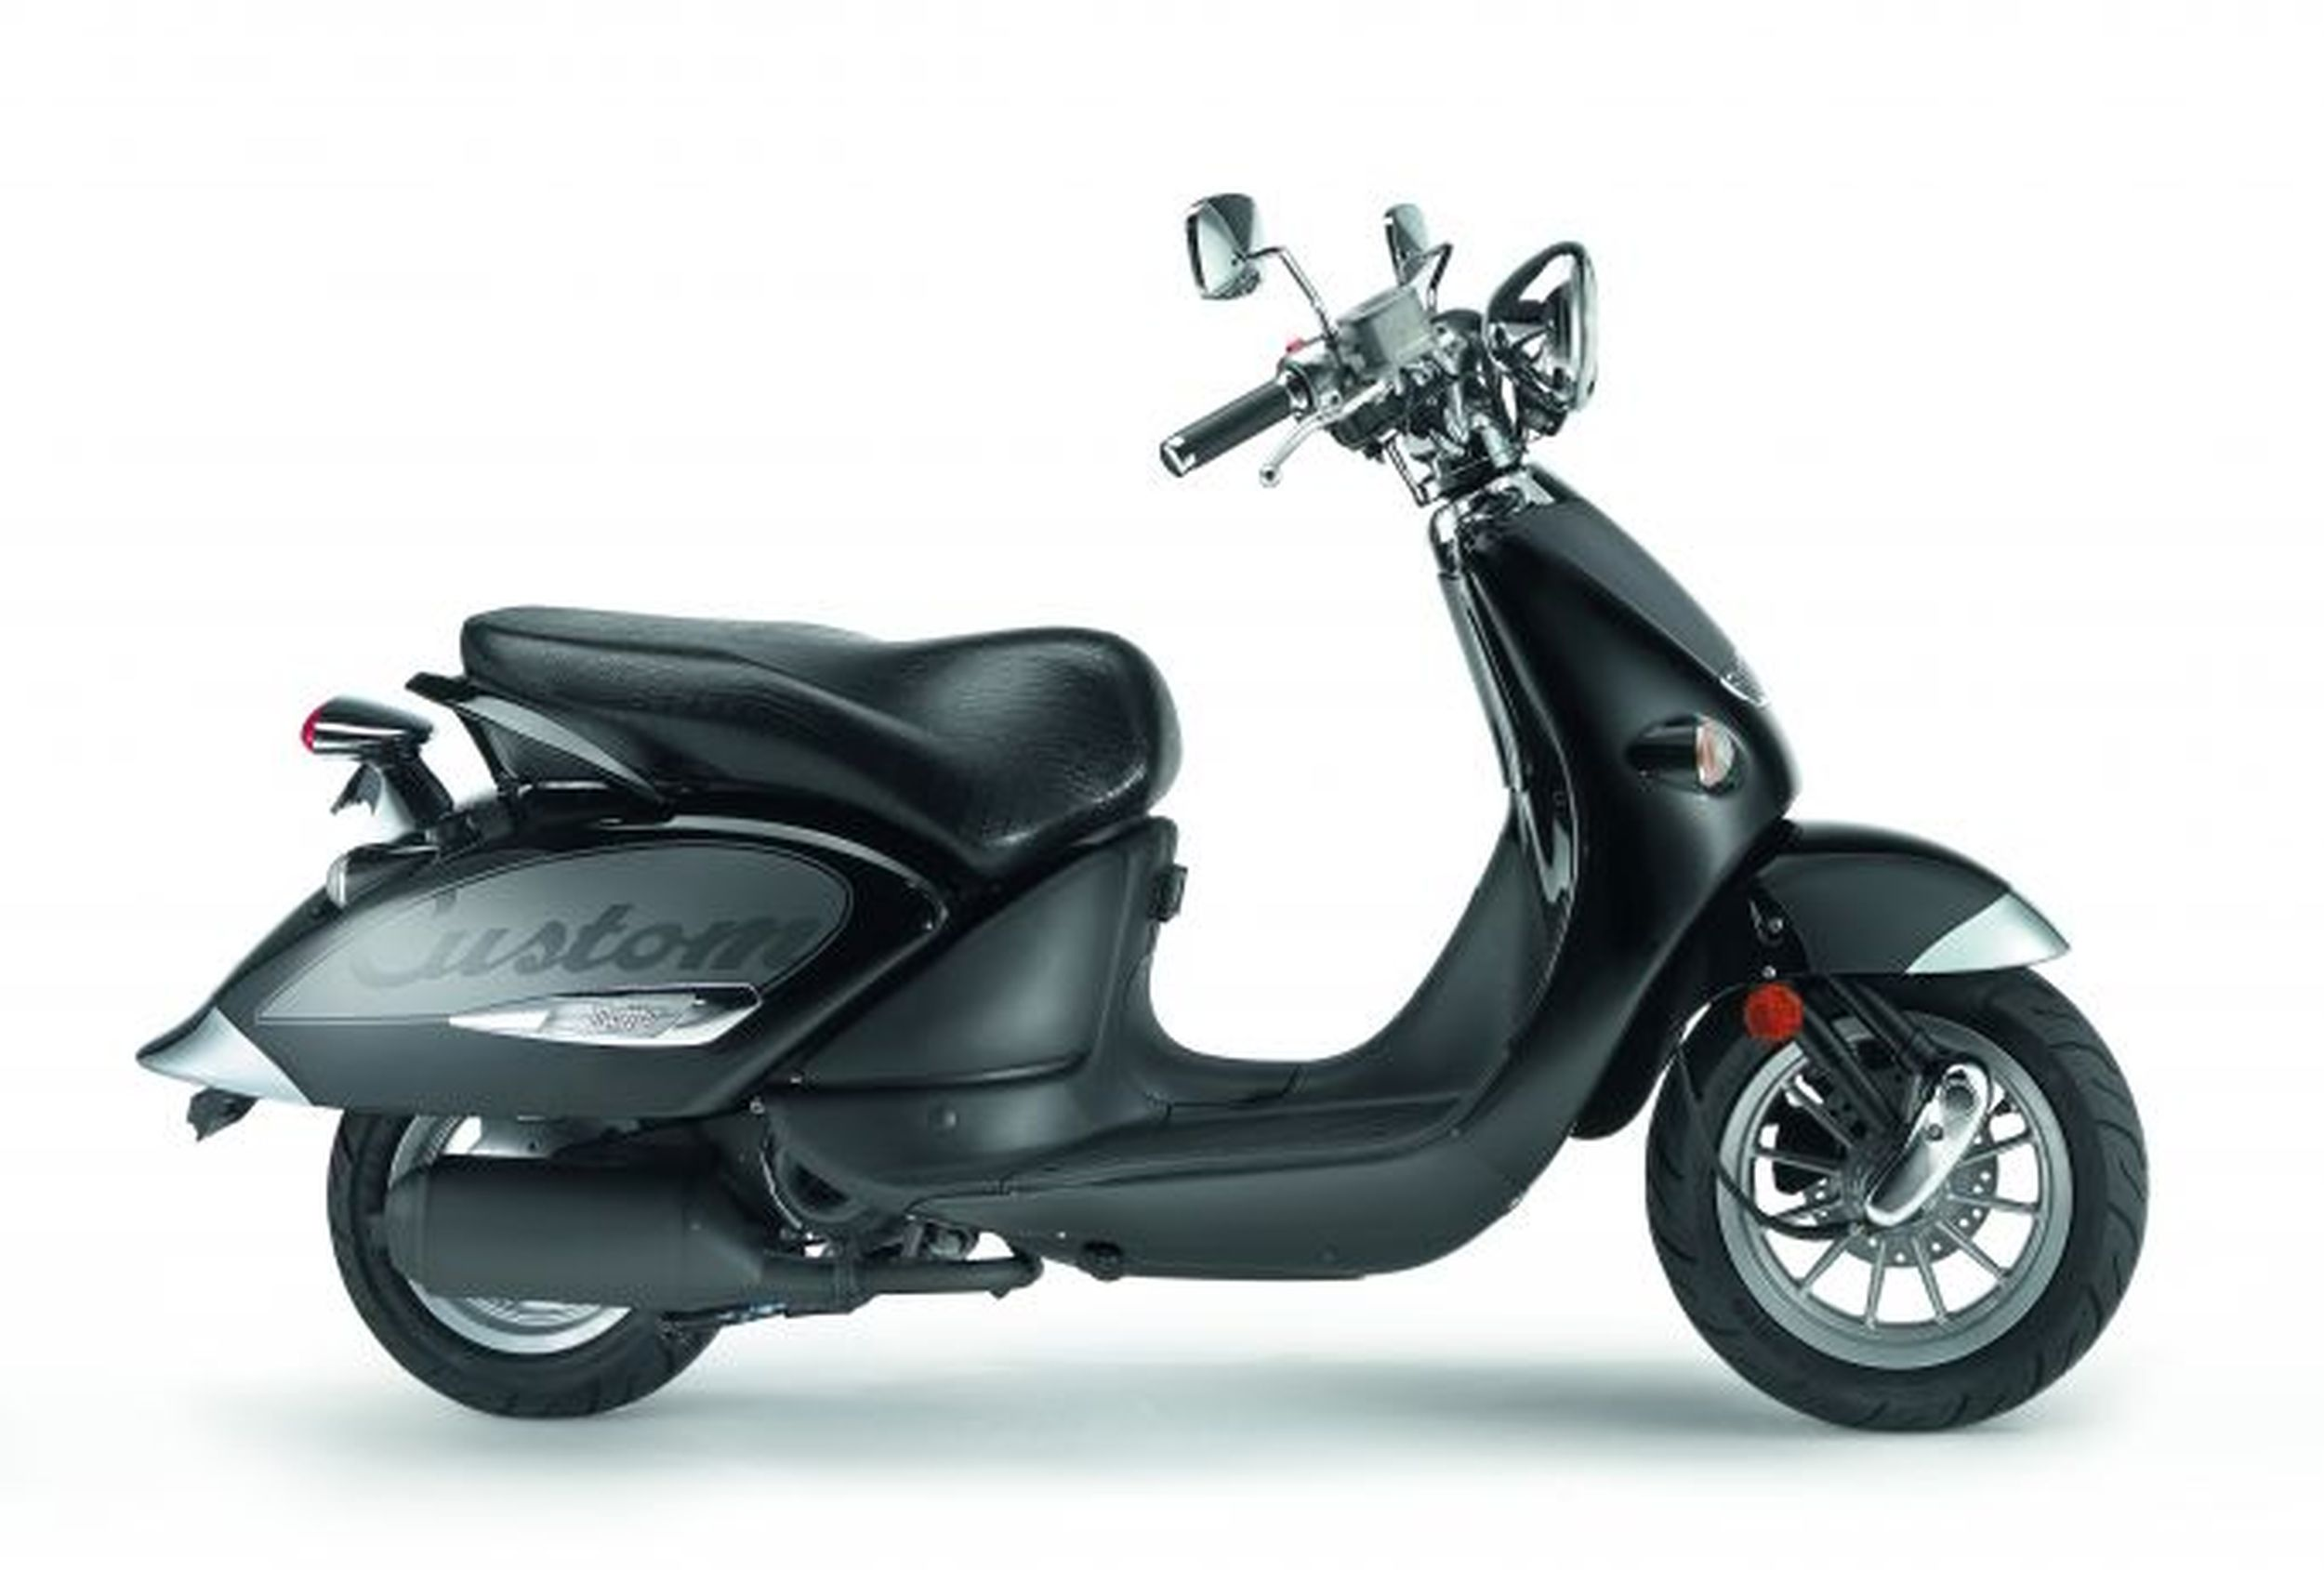 gebrauchte aprilia mojito 125 custom motorr der kaufen. Black Bedroom Furniture Sets. Home Design Ideas